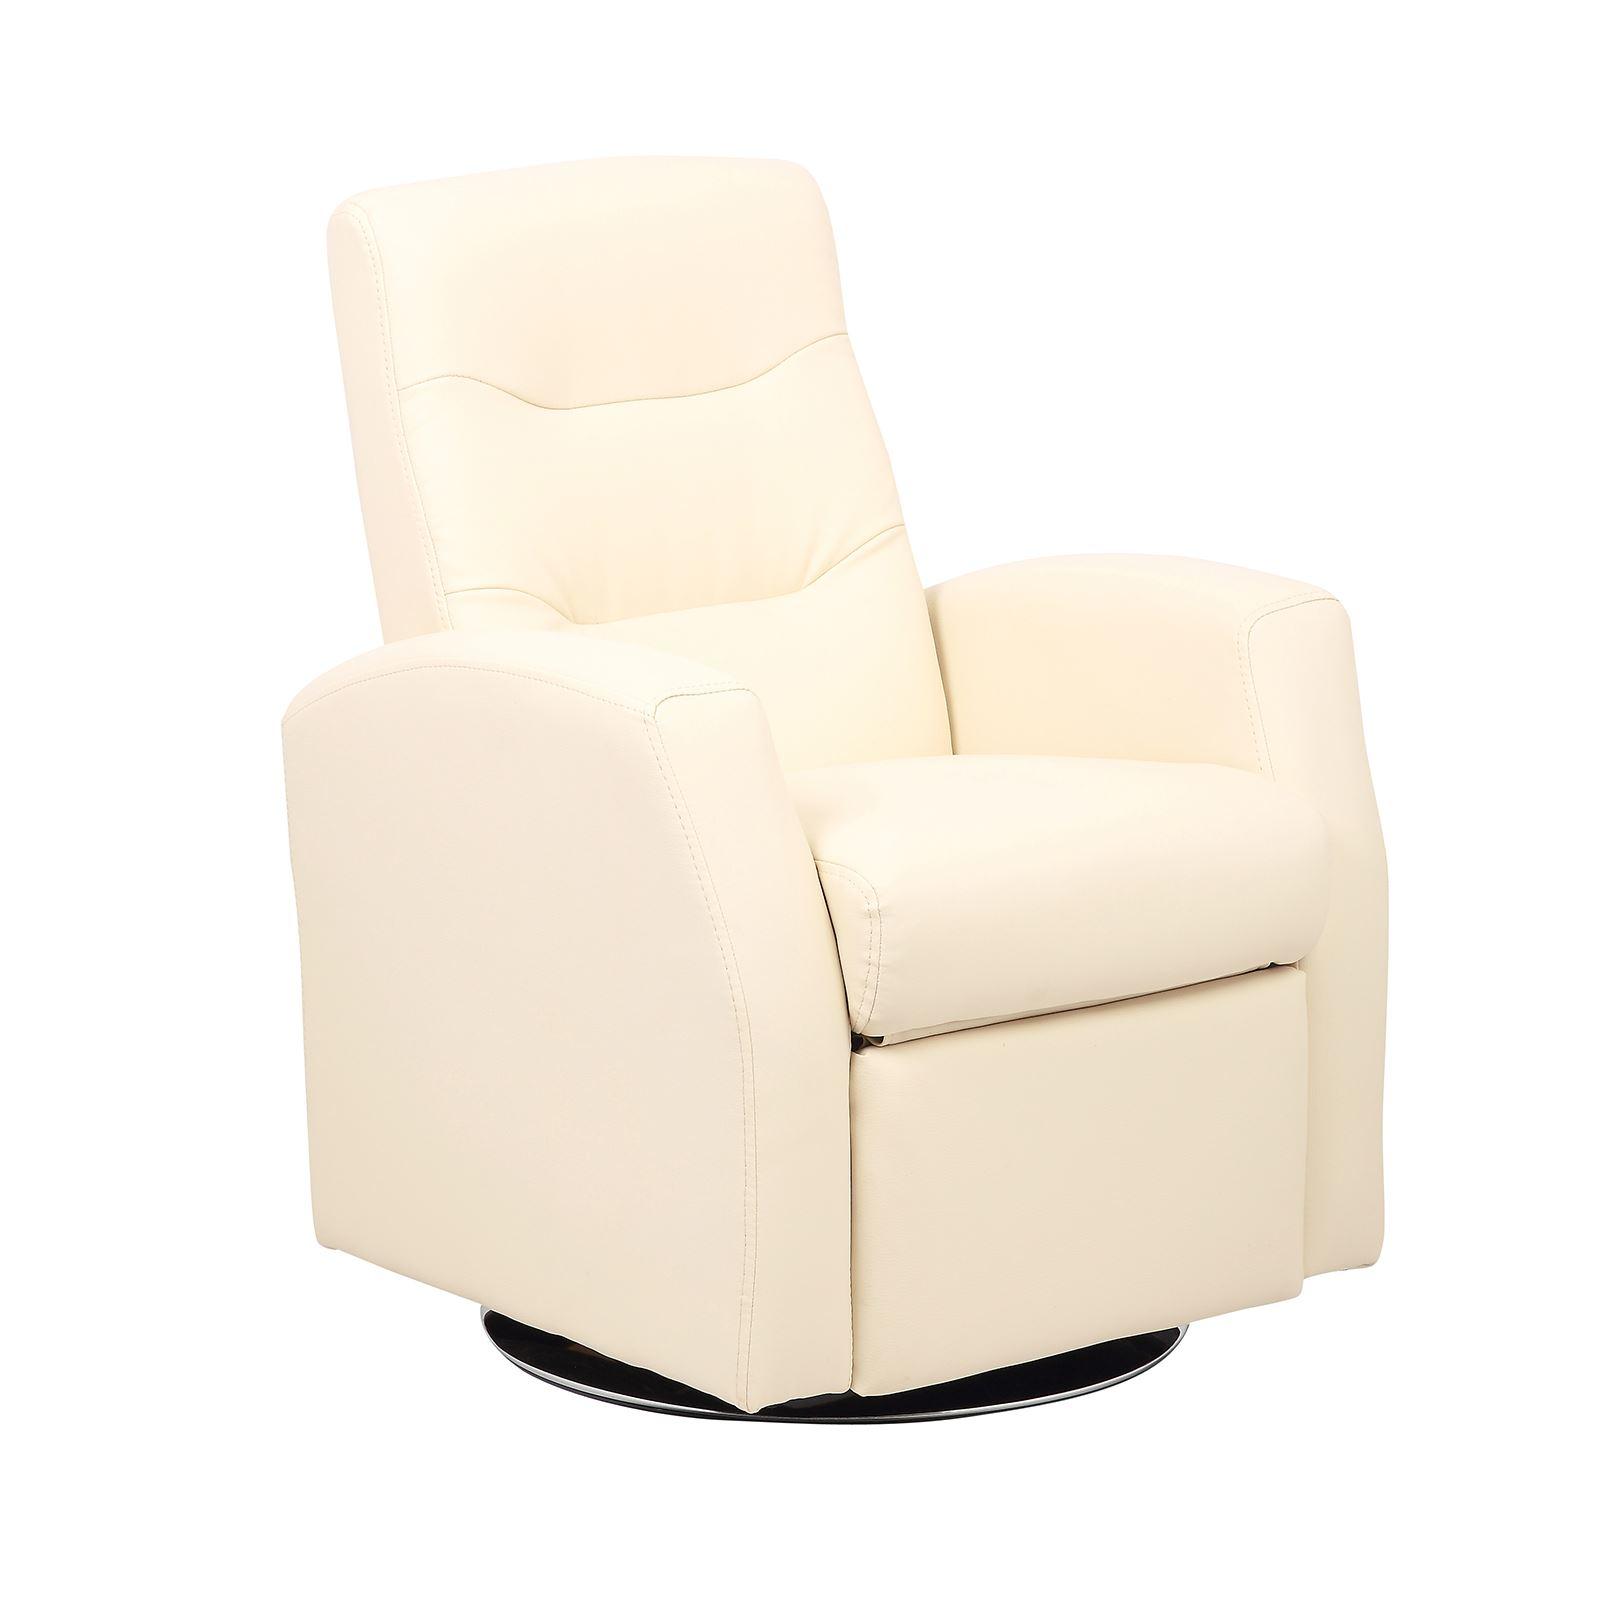 Luxury Kids Reclining Swivel Chair Childrens Comfortable